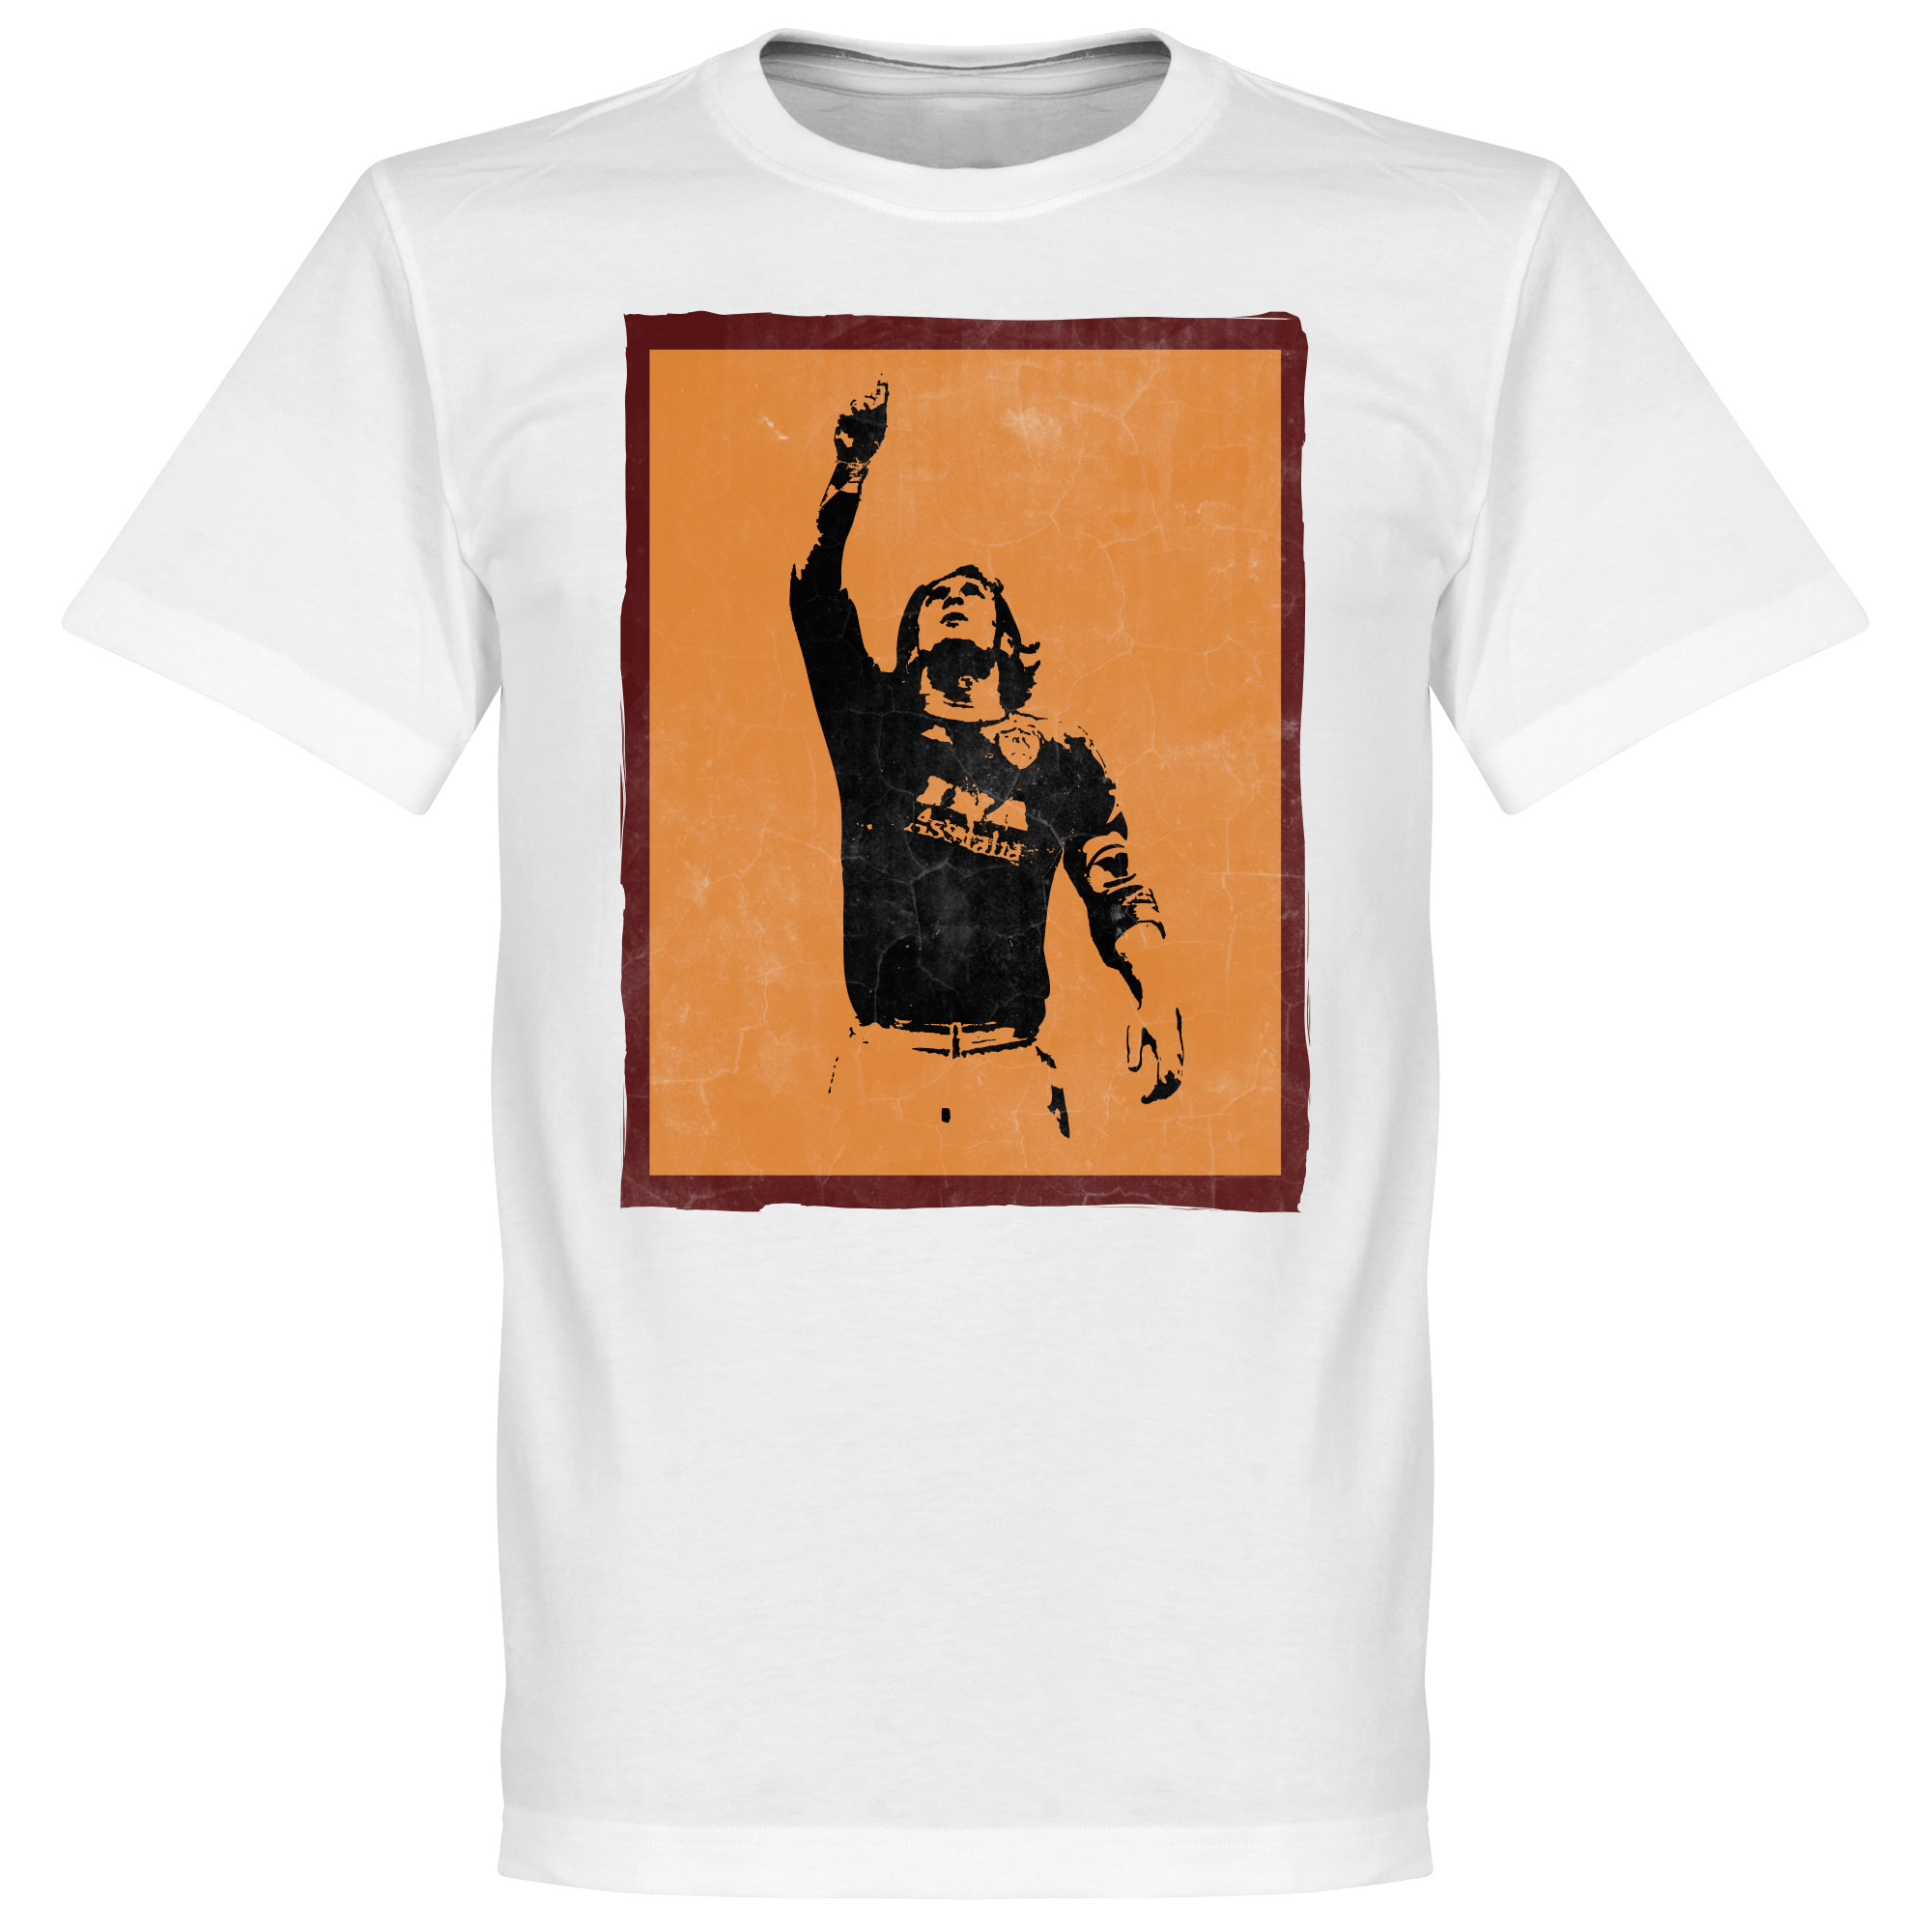 Totti Silhouette T-Shirt S